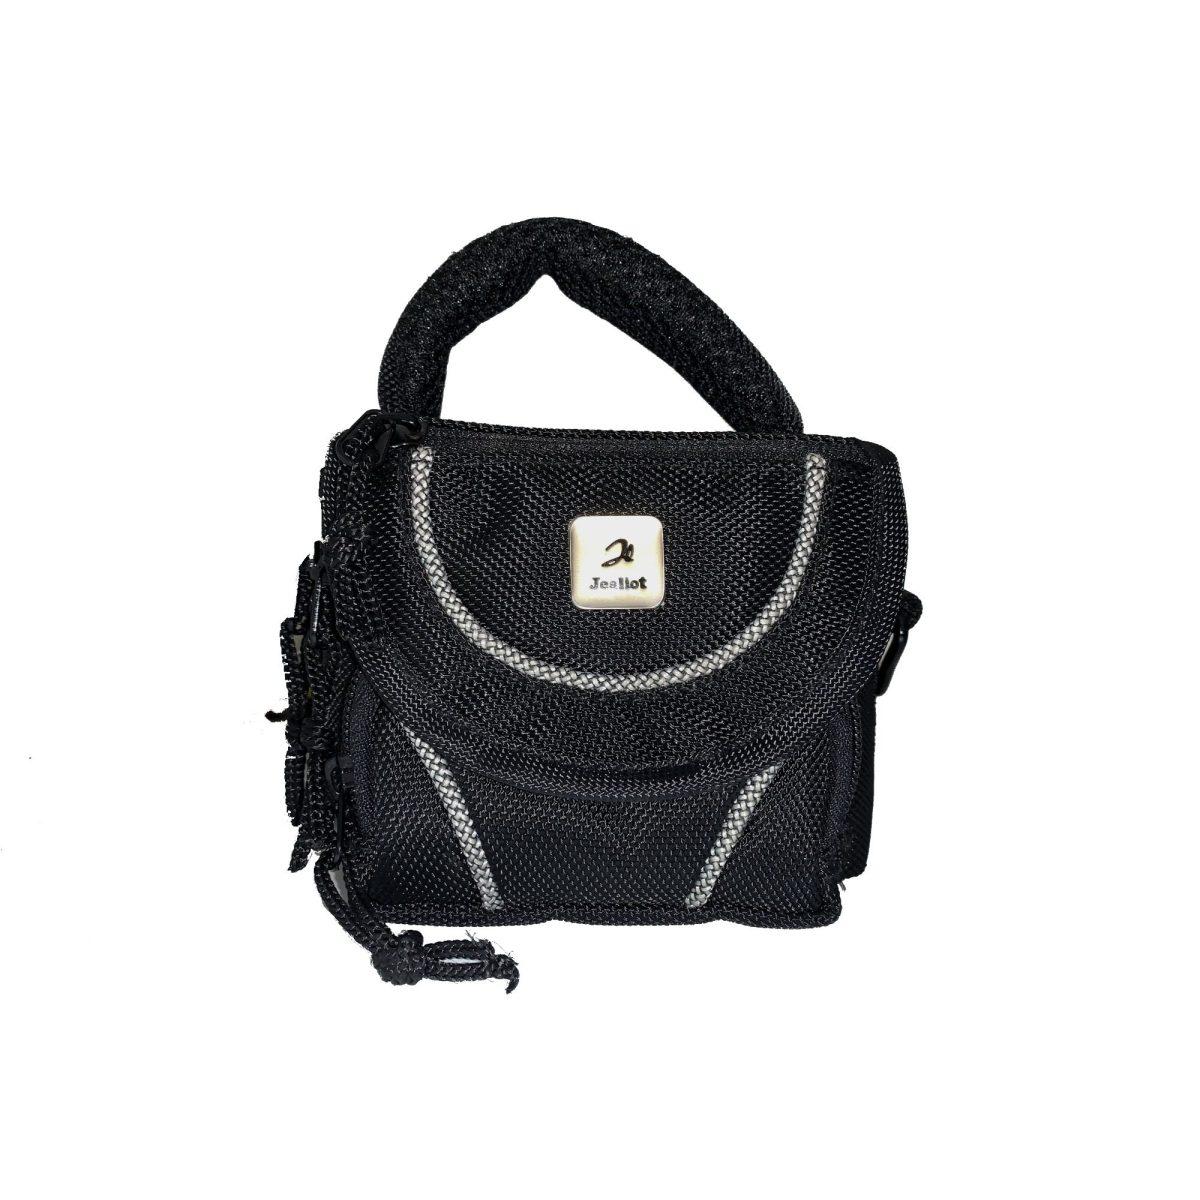 Jealiot A2222 Camera Bag